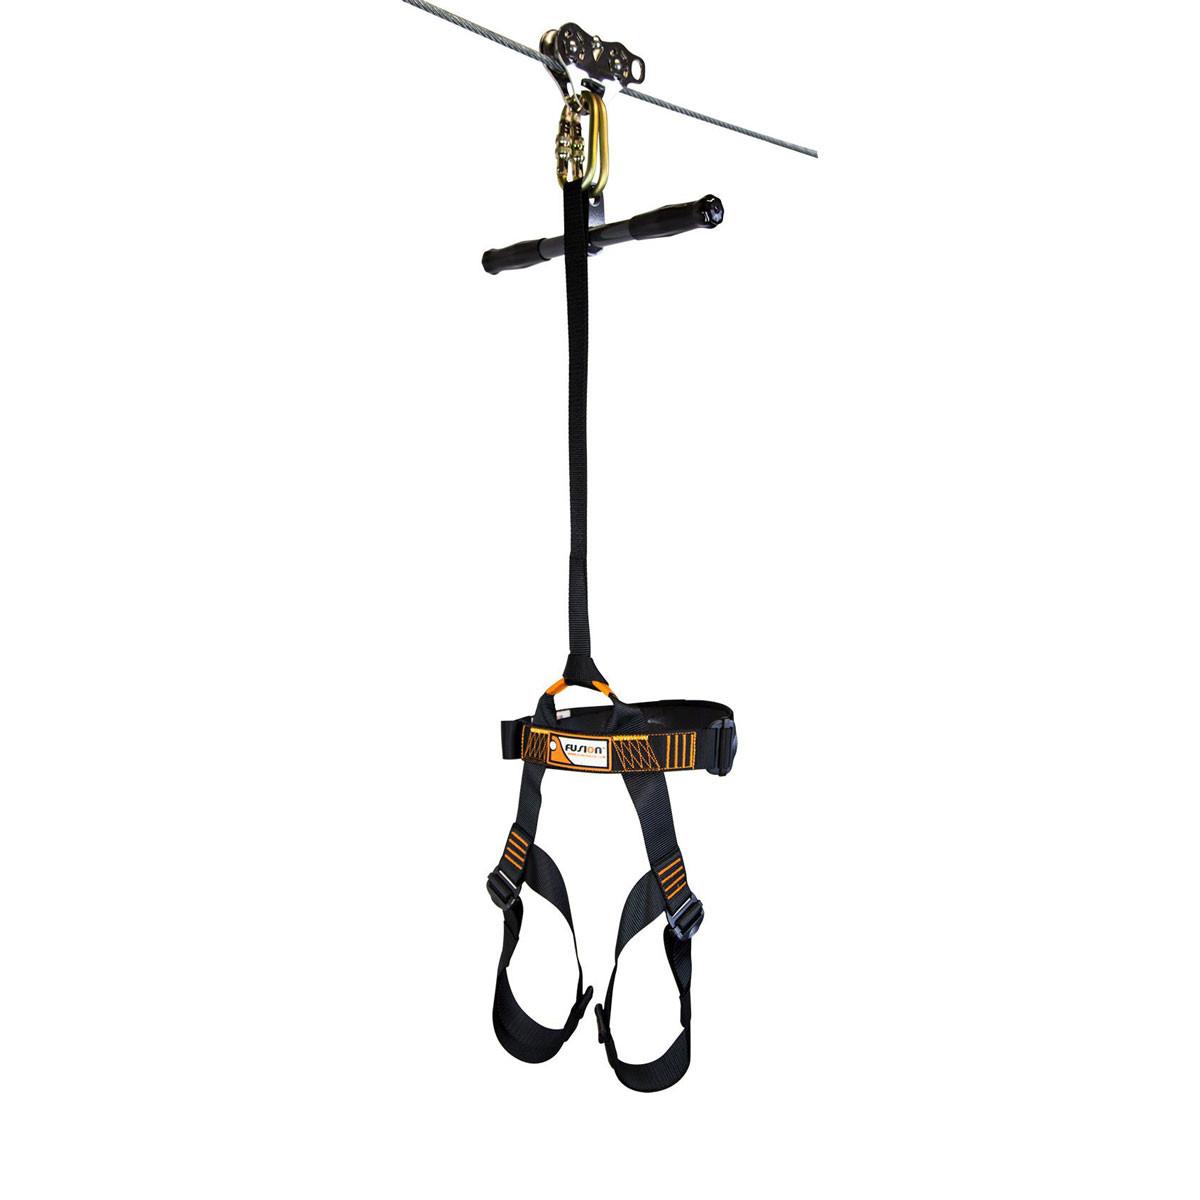 Ultimate Torpedo Zip Line Kit - Harness